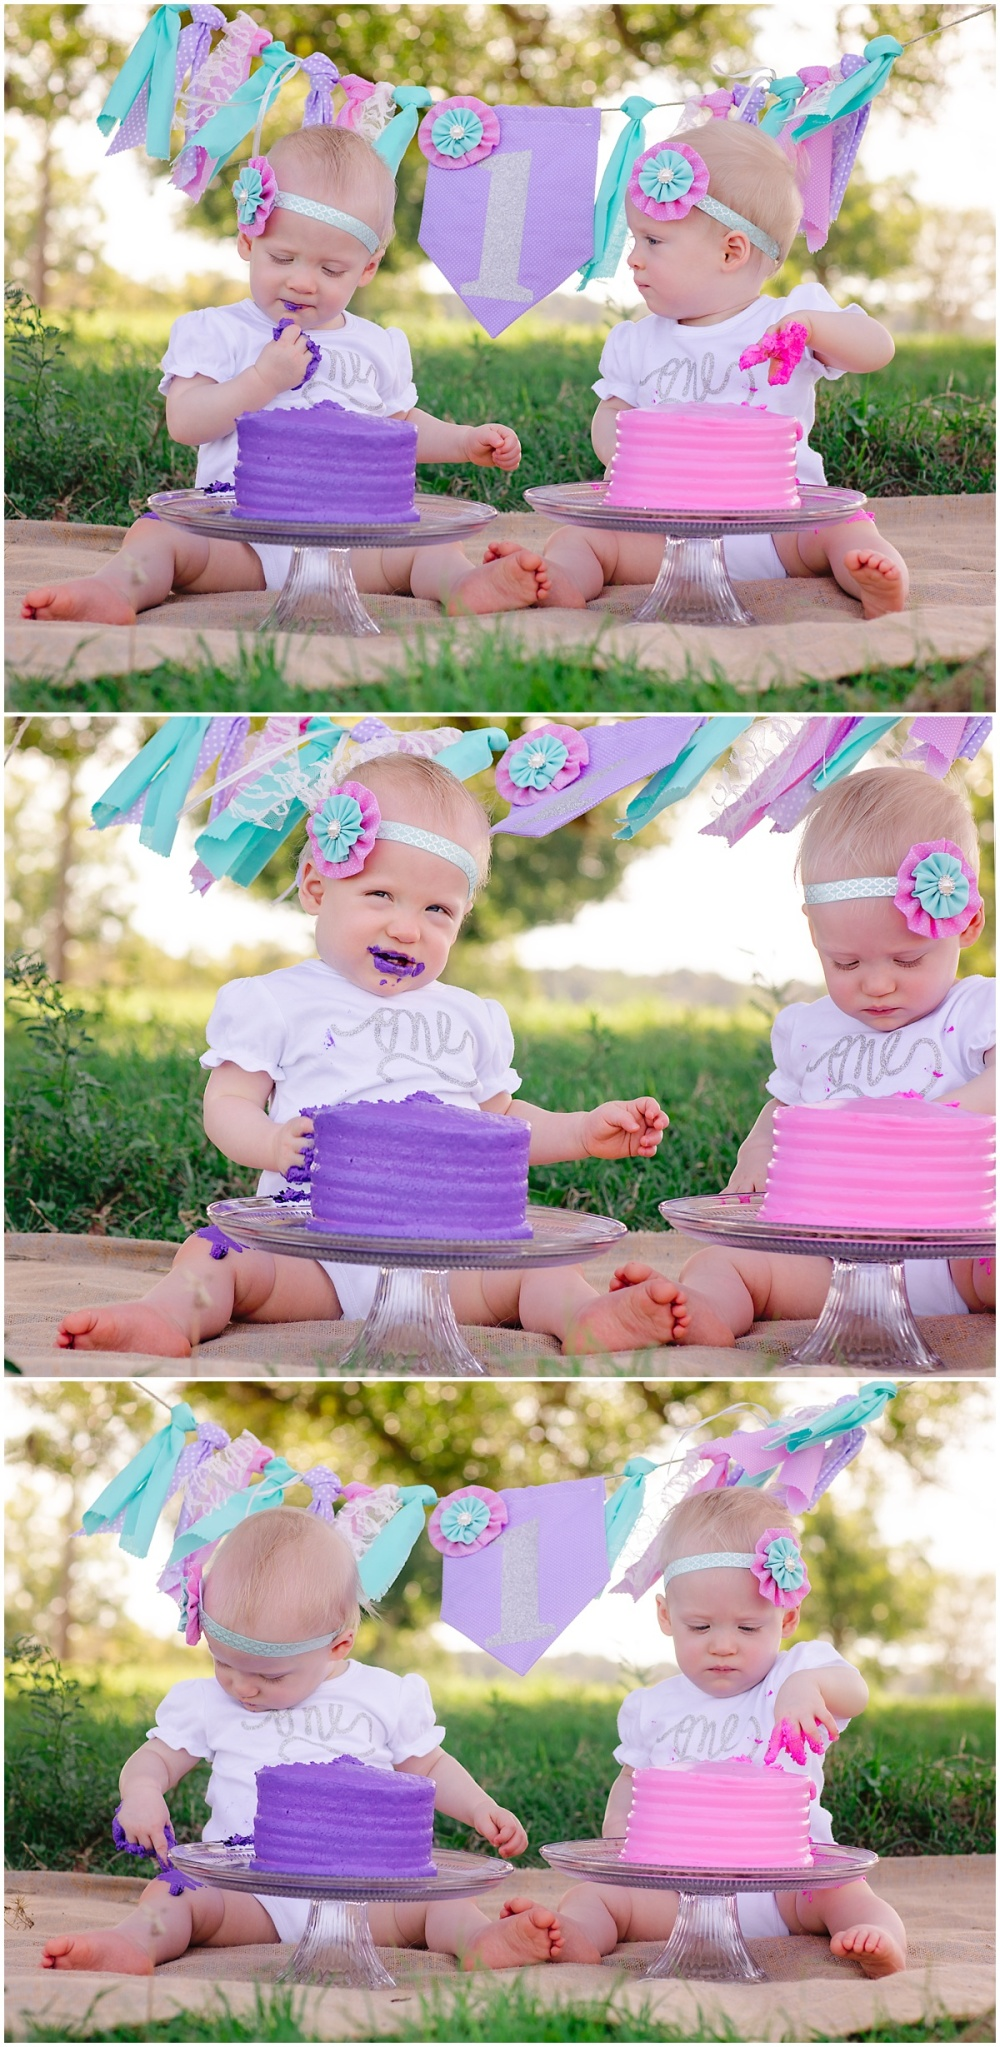 Family-Children-Portraits-Cake-Smash-Photos-San-Antonio-Hill-Country-Texas-Carly-Barton-Photography_0013.jpg